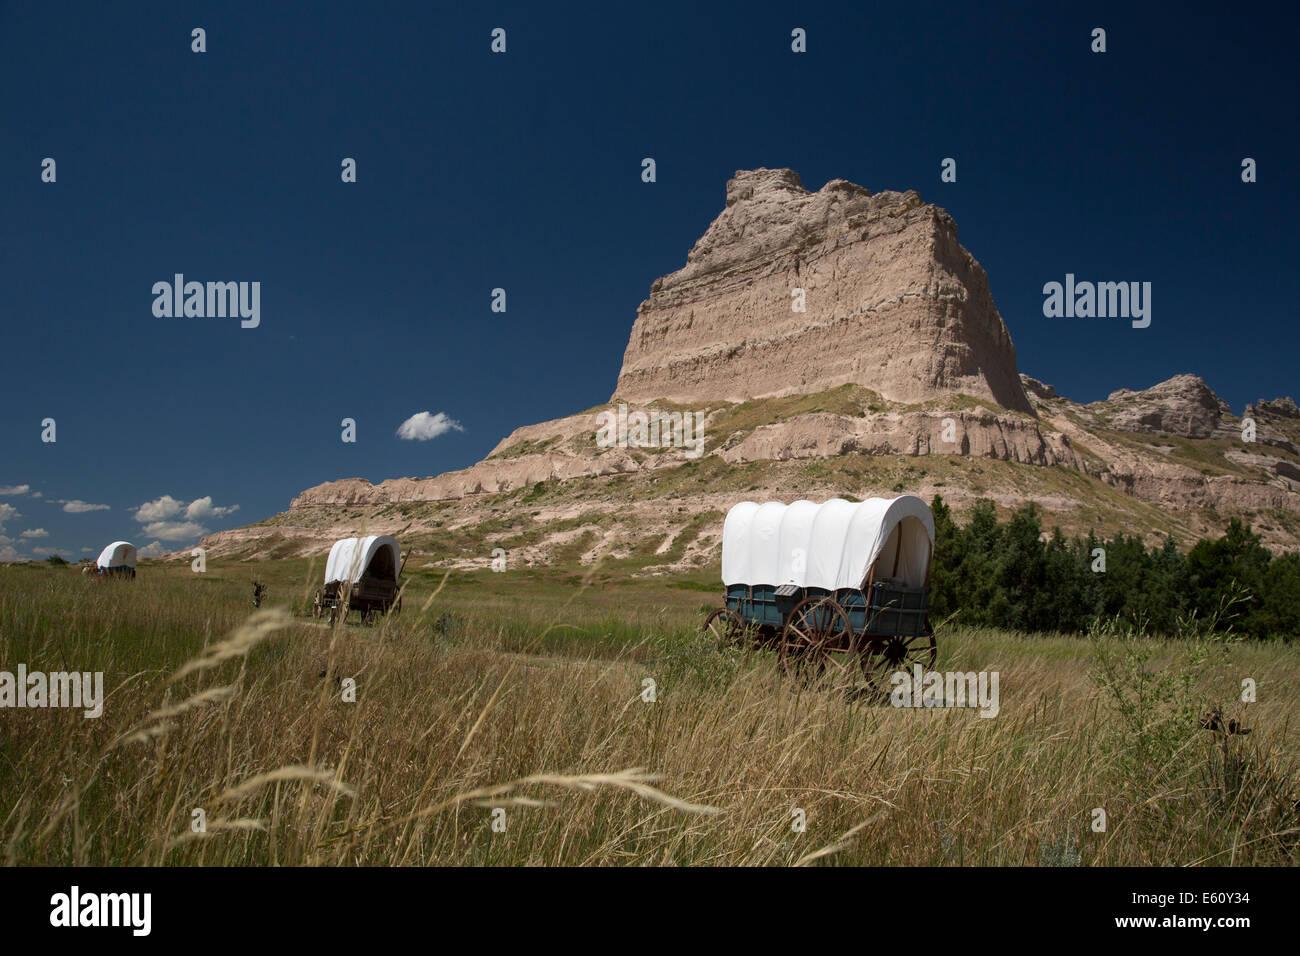 Scottsbluff, Nebraska - Scotts Bluff National Monument. - Stock Image